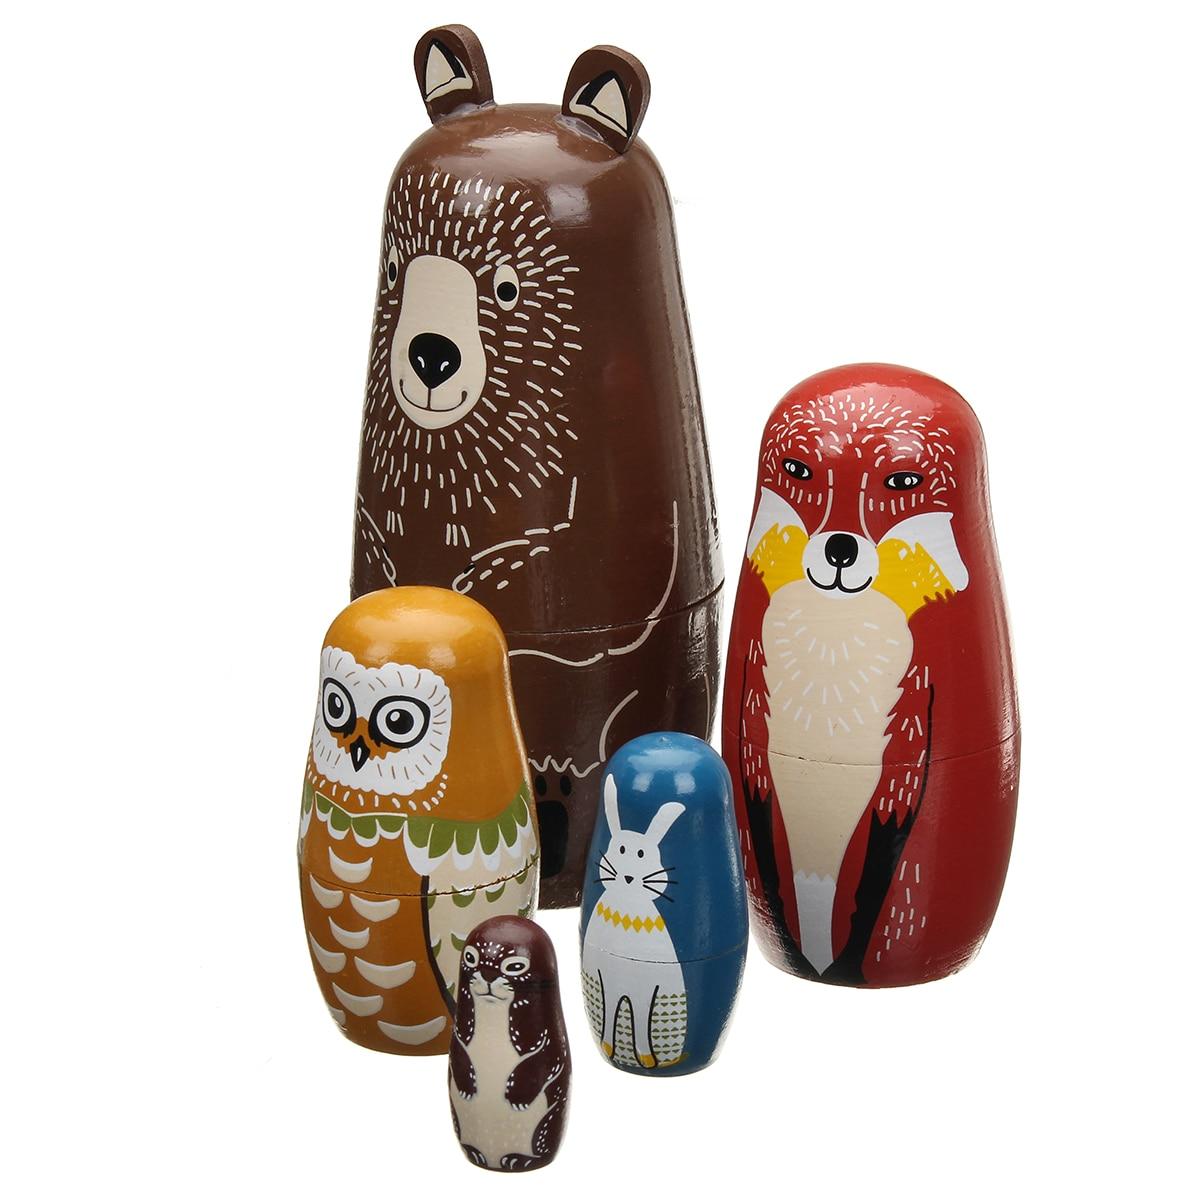 1Set Wooden Russian Dolls Kids Toy Gifts Animals Santa Claus Jesus Girl DIY Unpainted Blank Embryo Nesting Matryoshka Toy Gift